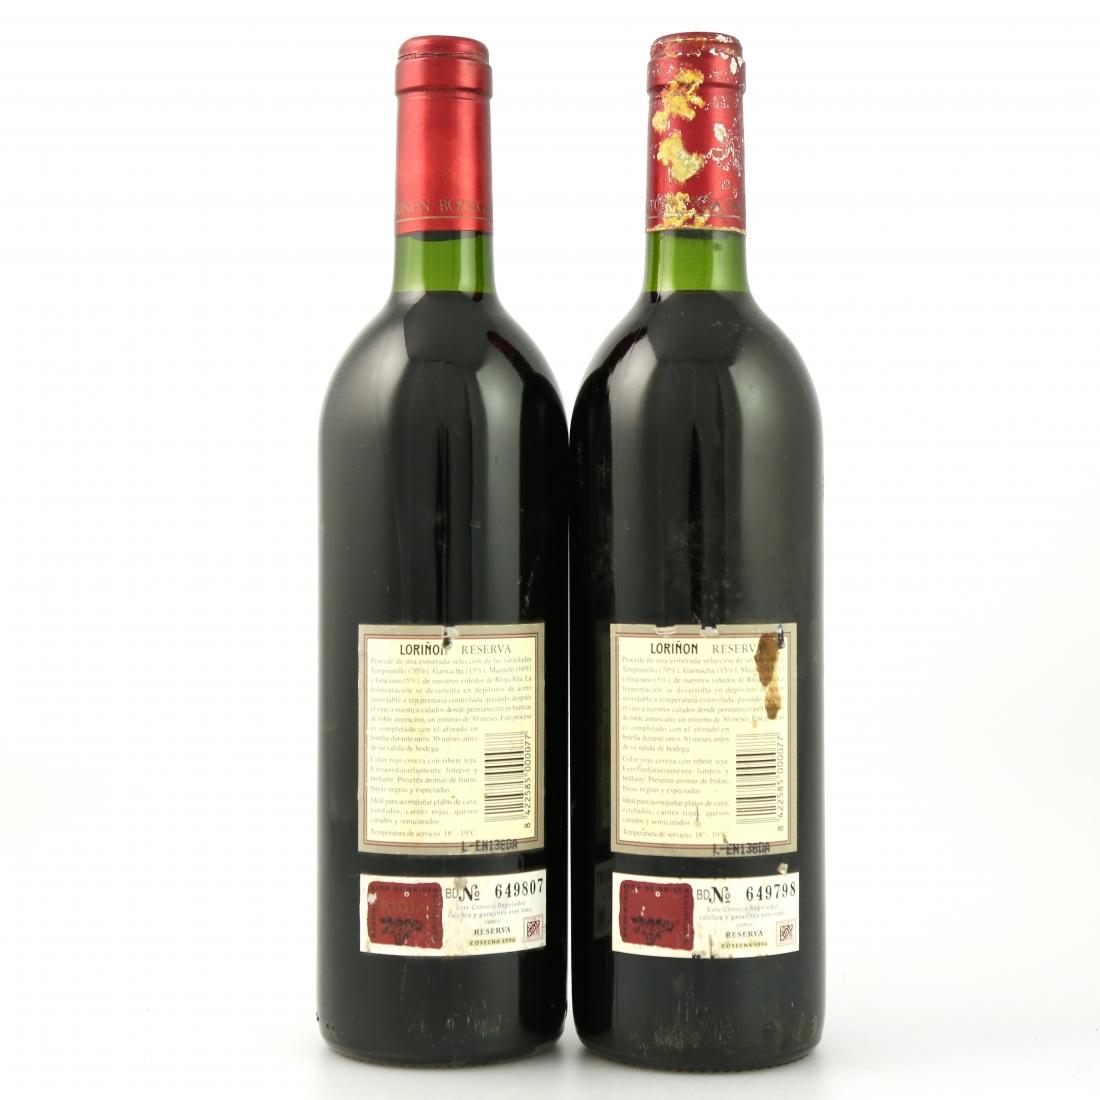 Loriñon 1994 Rioja Reserva 2x75cl